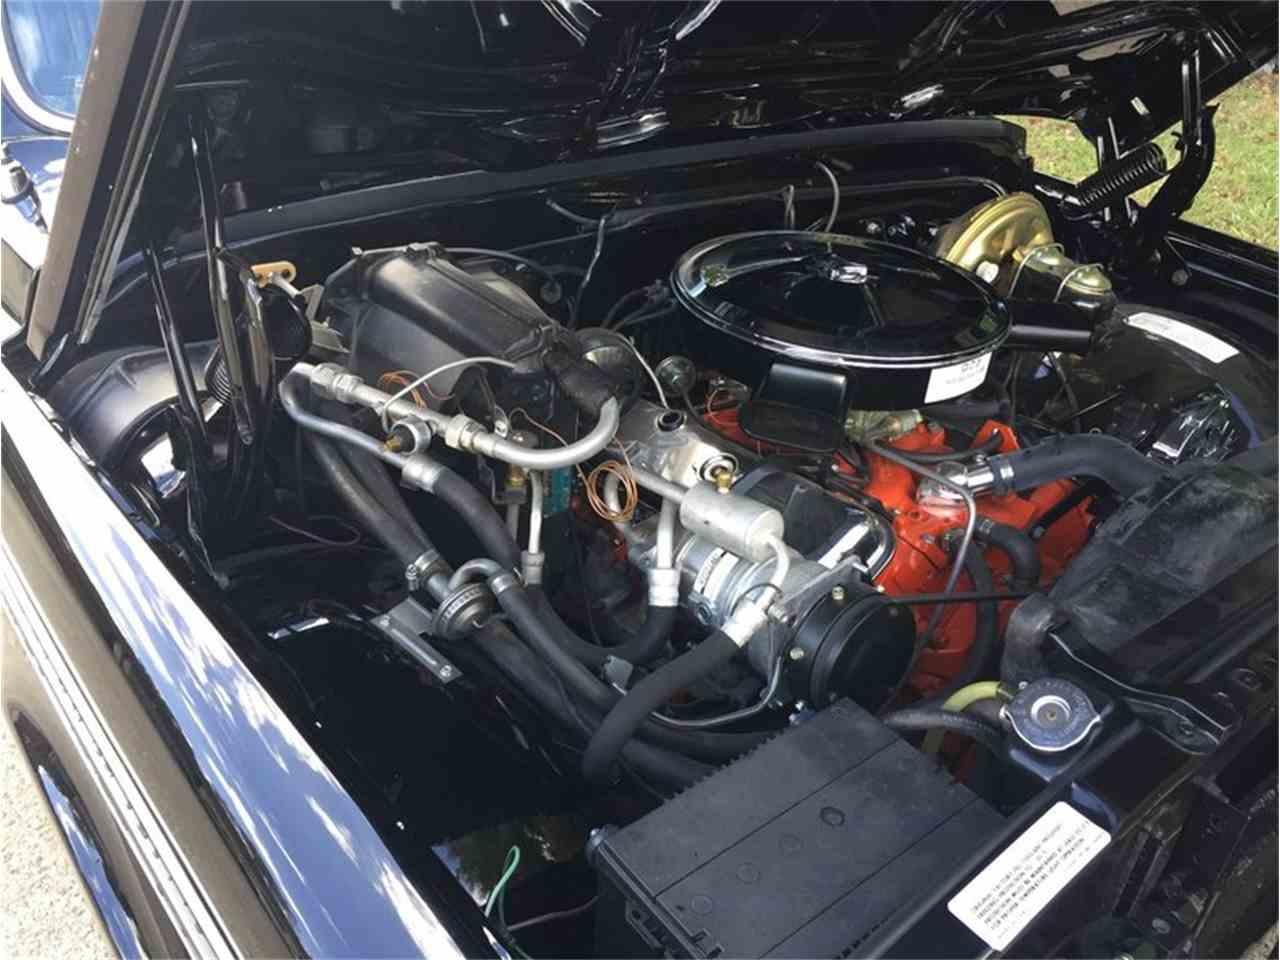 All Chevy 1972 chevrolet cheyenne super : 1972 Chevrolet Cheyenne Super 10 Pickup for Sale   ClassicCars.com ...